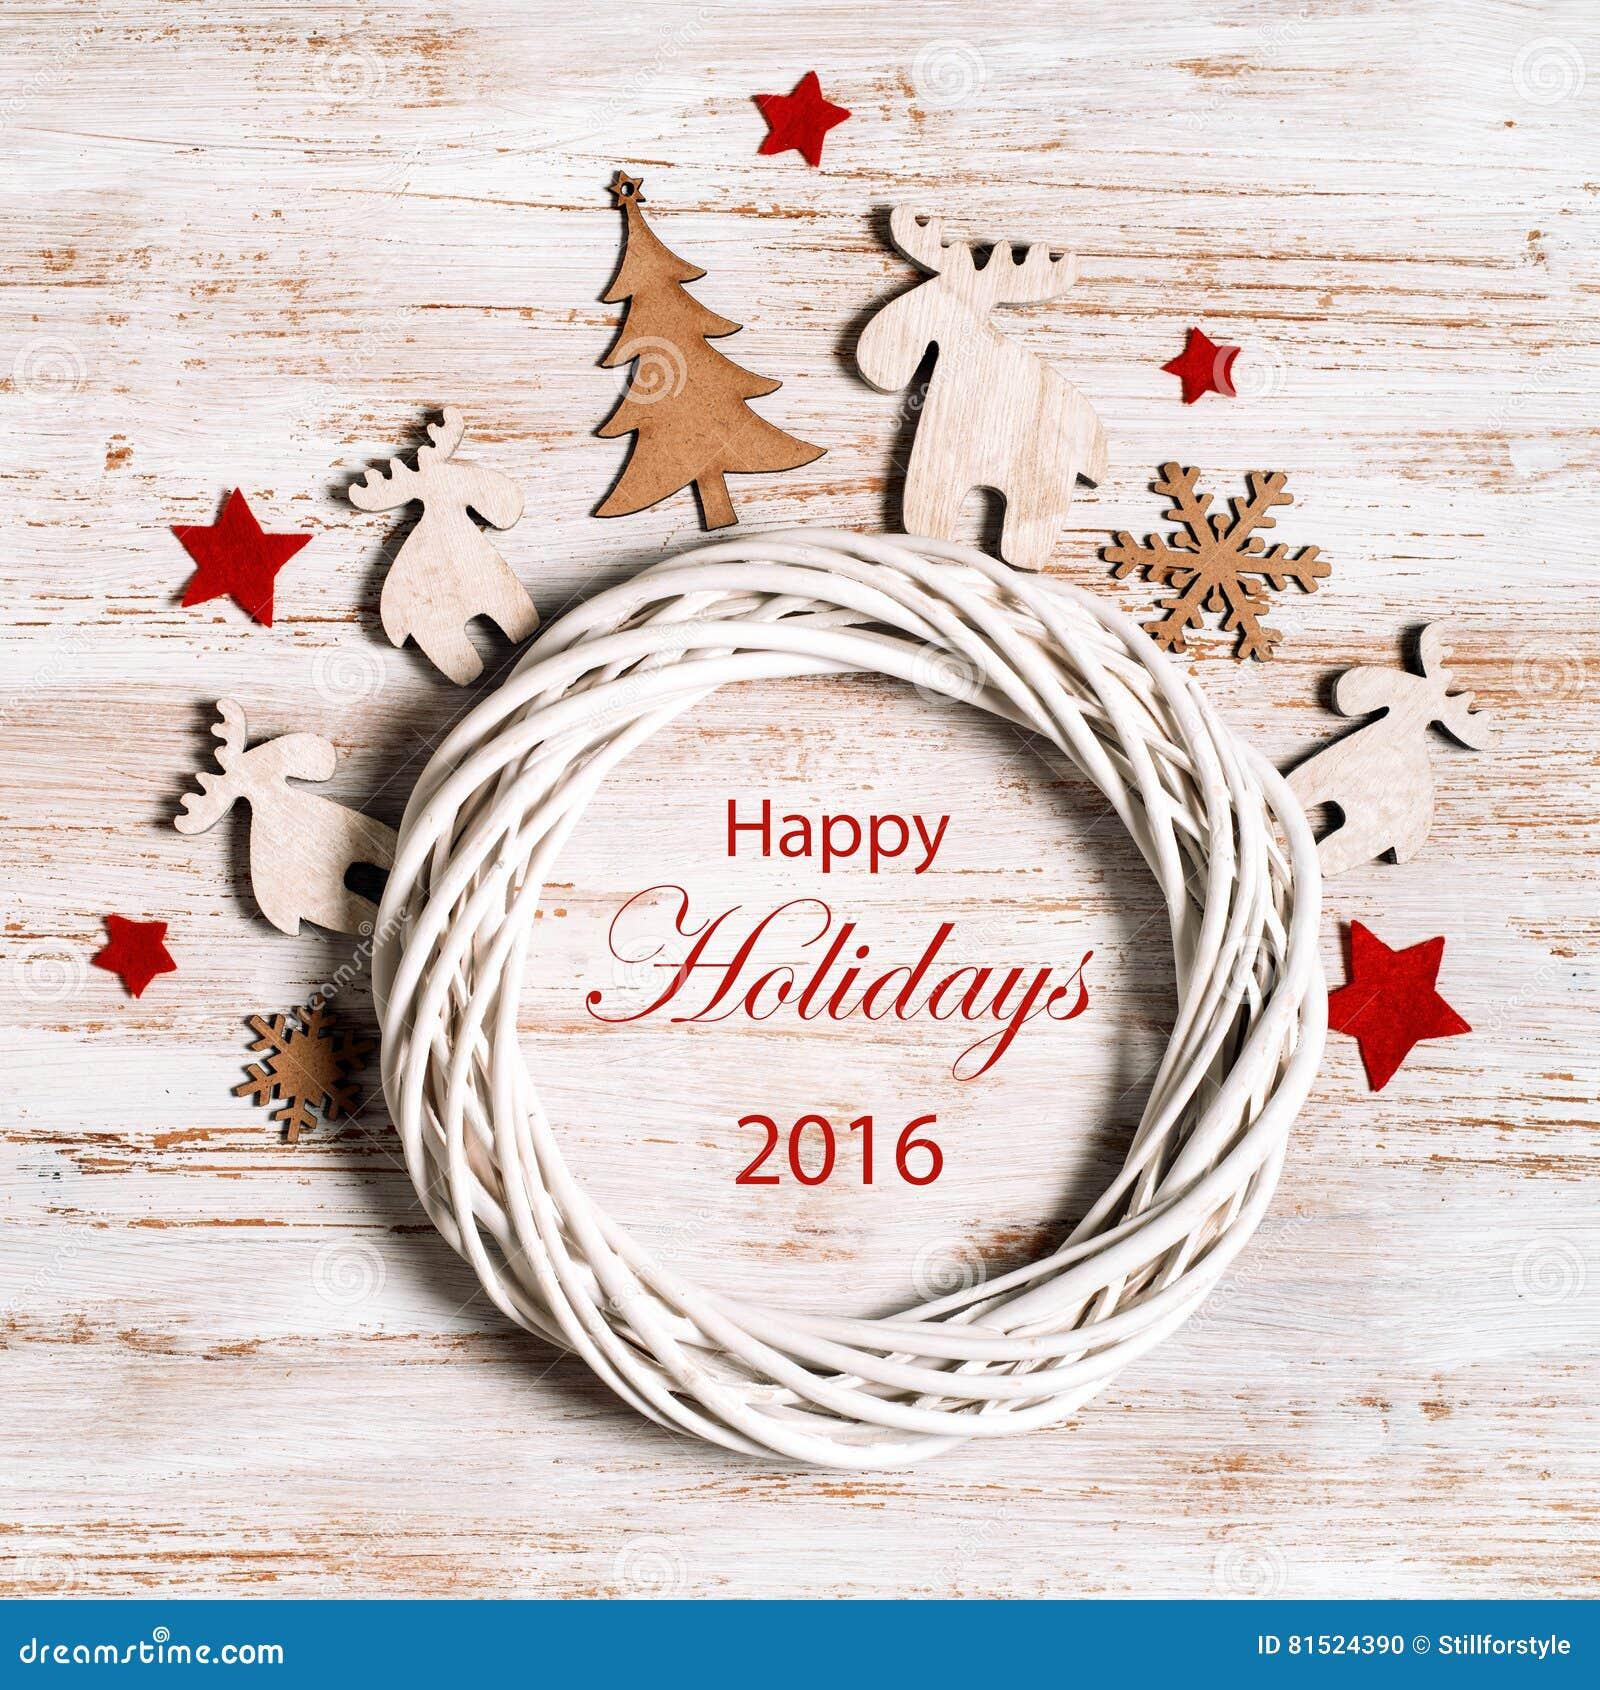 Happy Holidays Wallpaper On Shabby Chic Style Stock Illustration